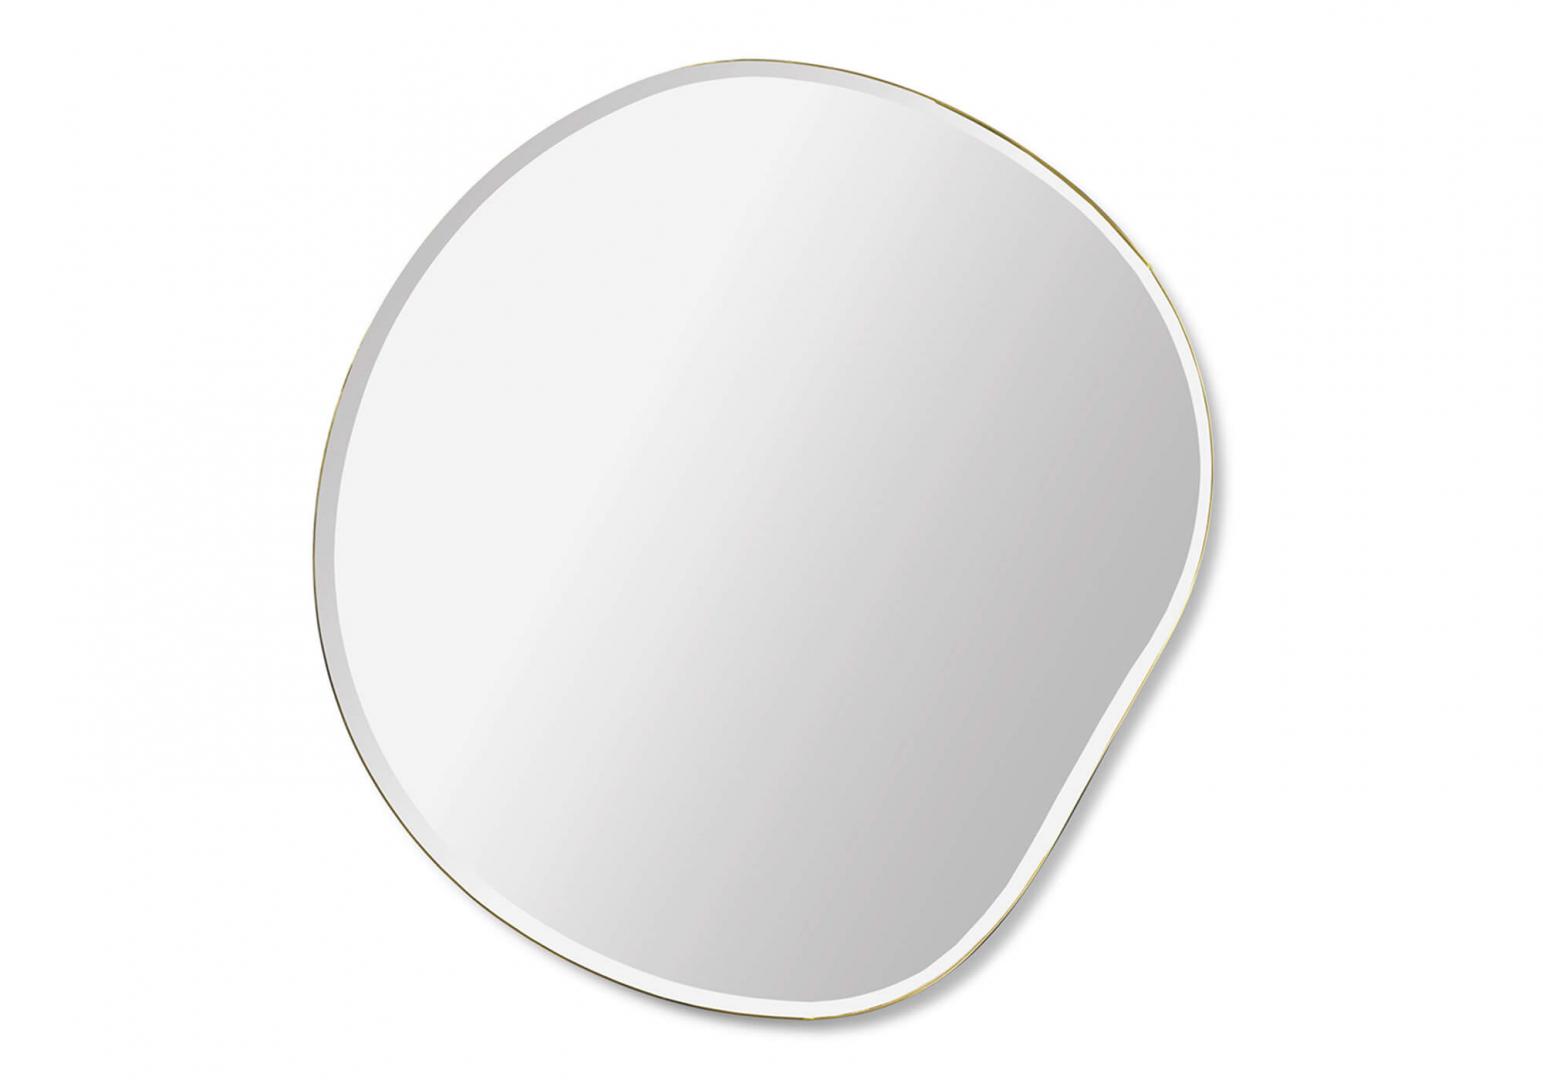 Petit miroir pond - FERM LIVING